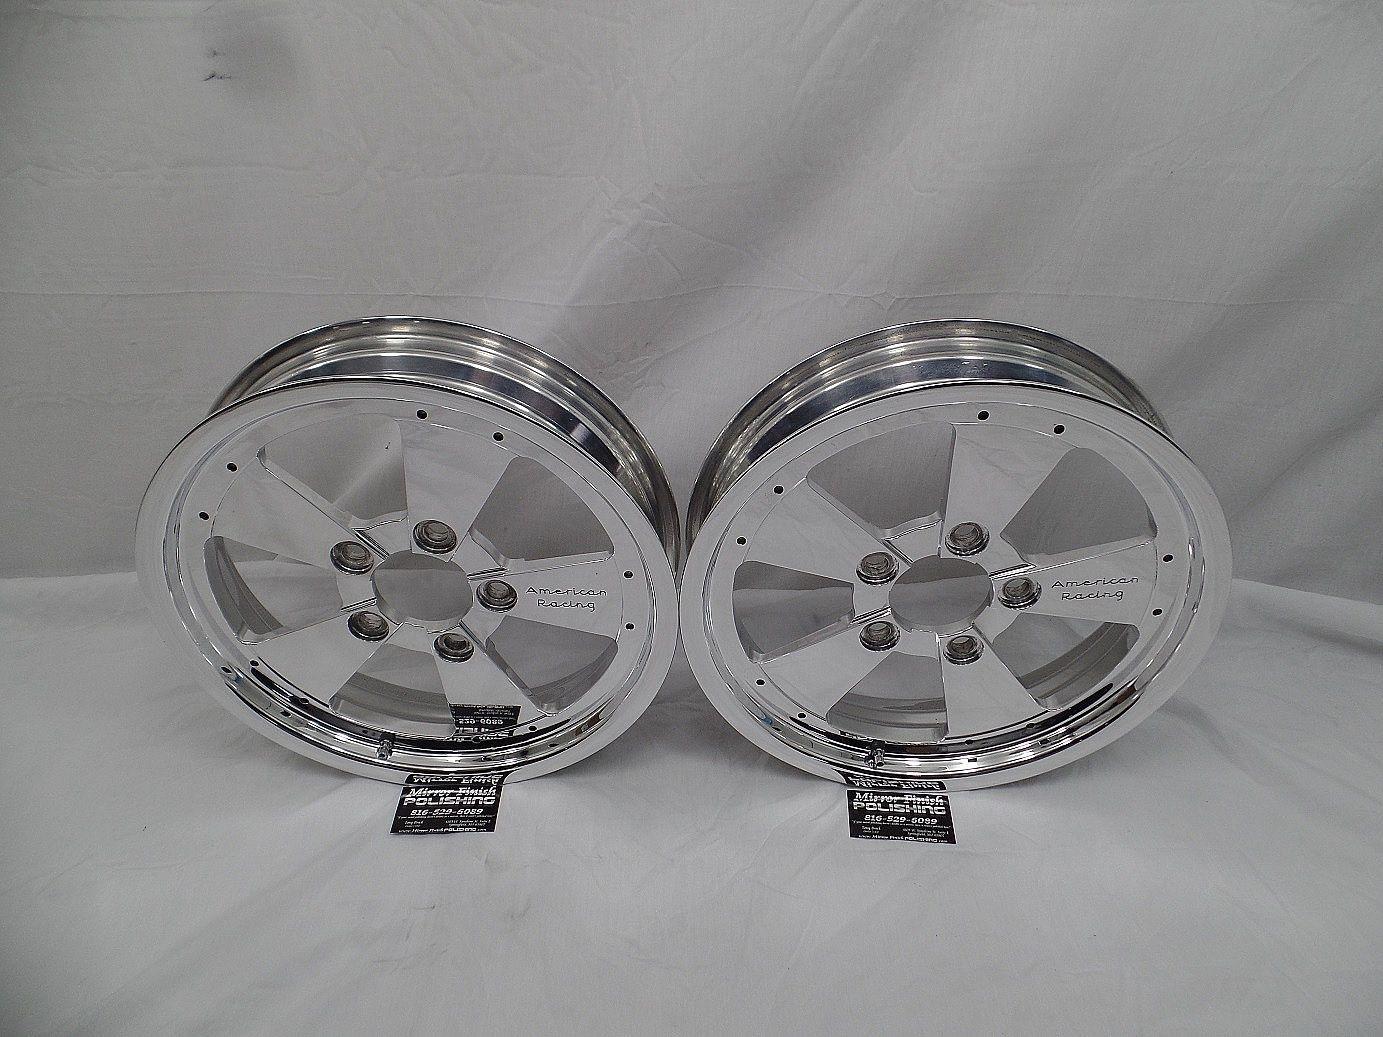 Yes, we polish American Racing Wheels too! American Racing